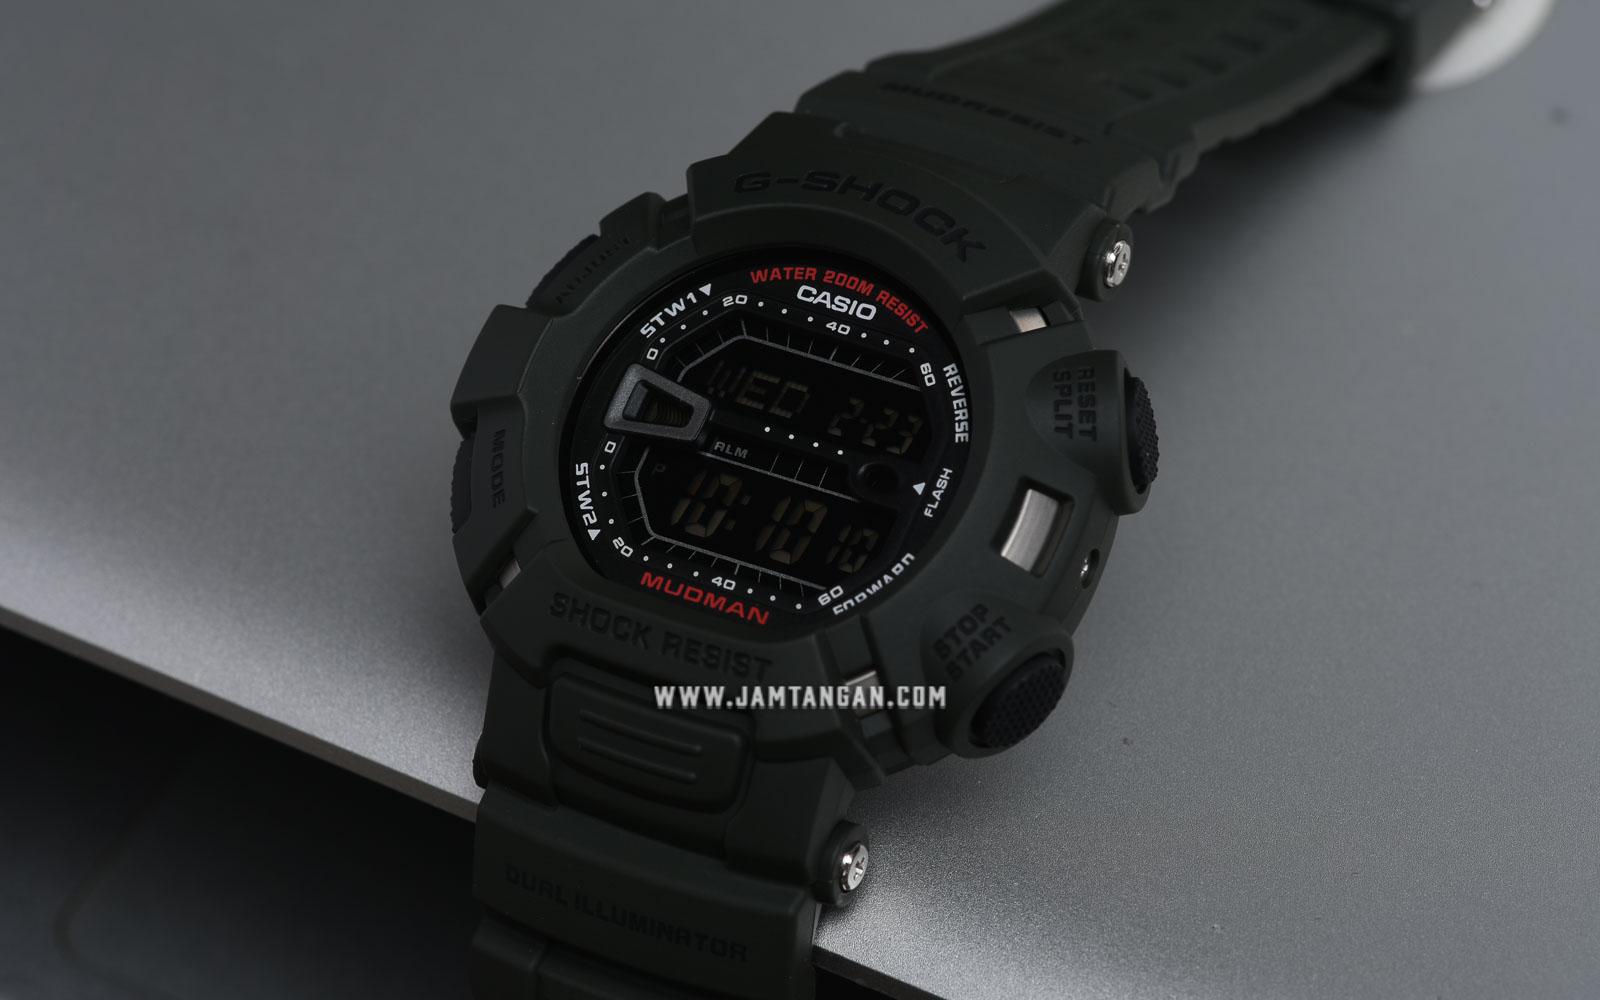 Casio G-Shock G-9000-3VDR Mudman Digital Green Resin Band Water Resistant 200M Machtwatch